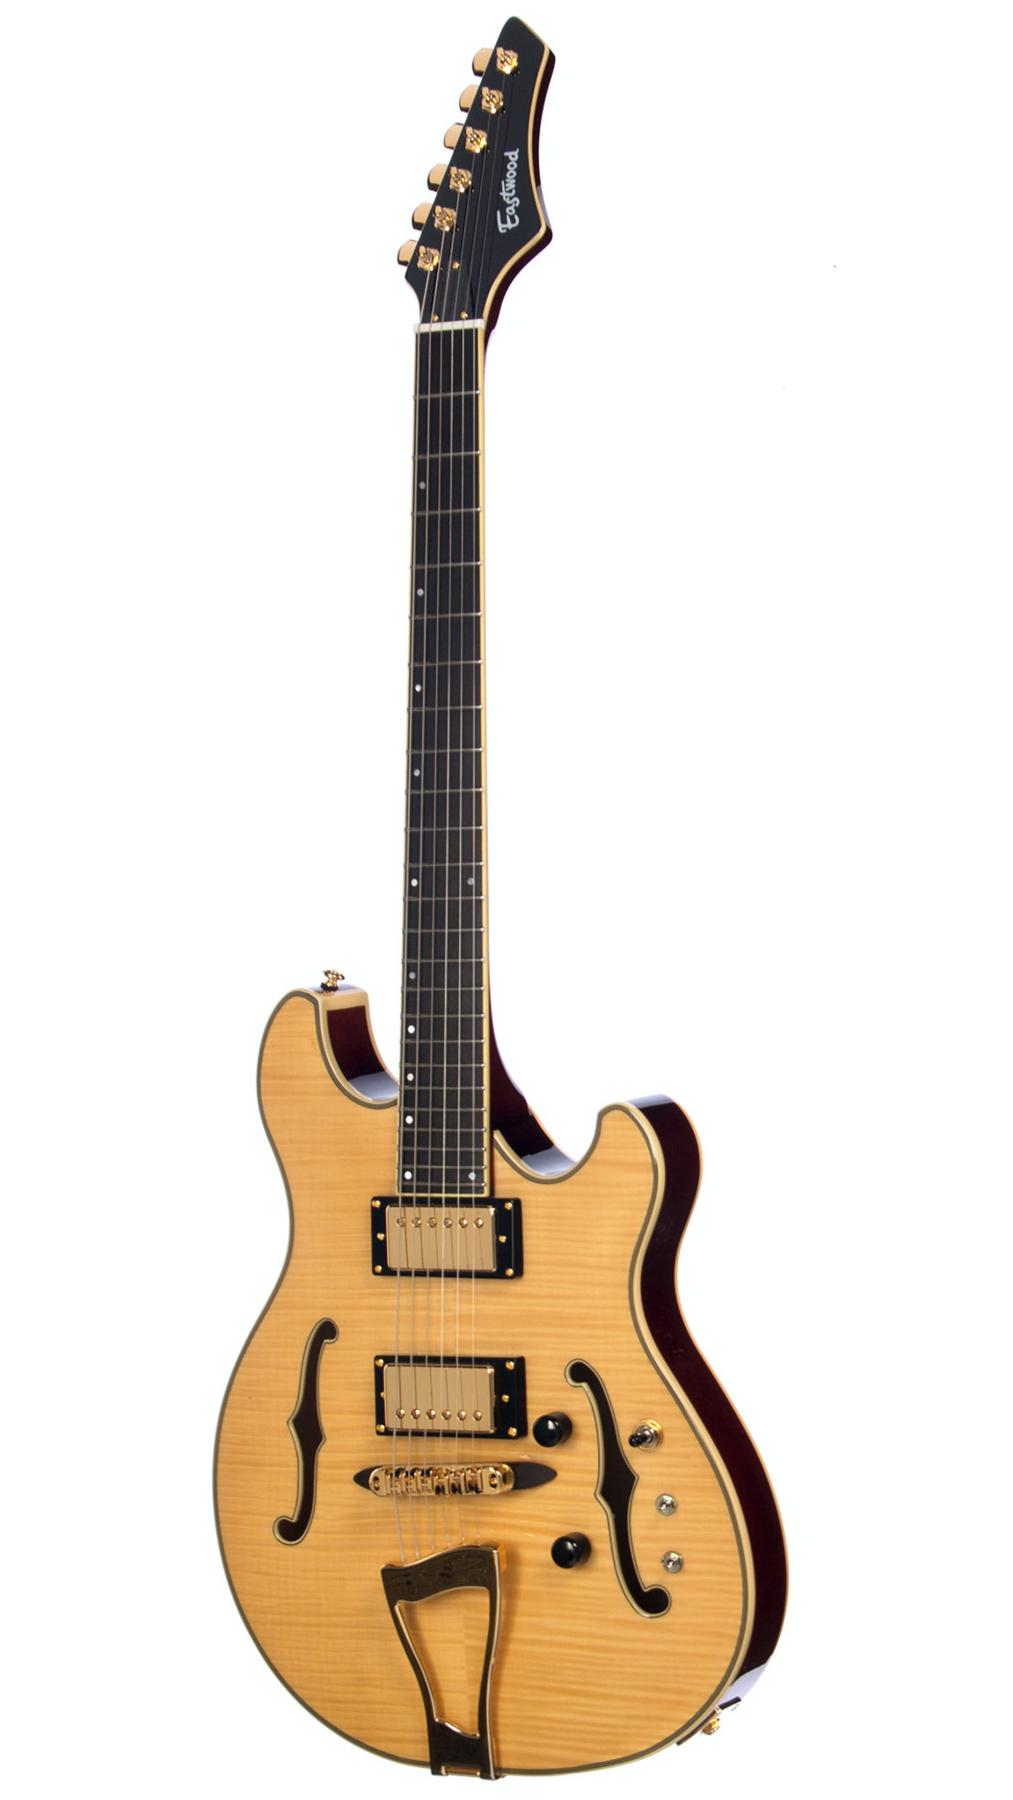 Languedoc (ie trey anastasio's) guitars-phish2_1800x1800-png-jpg